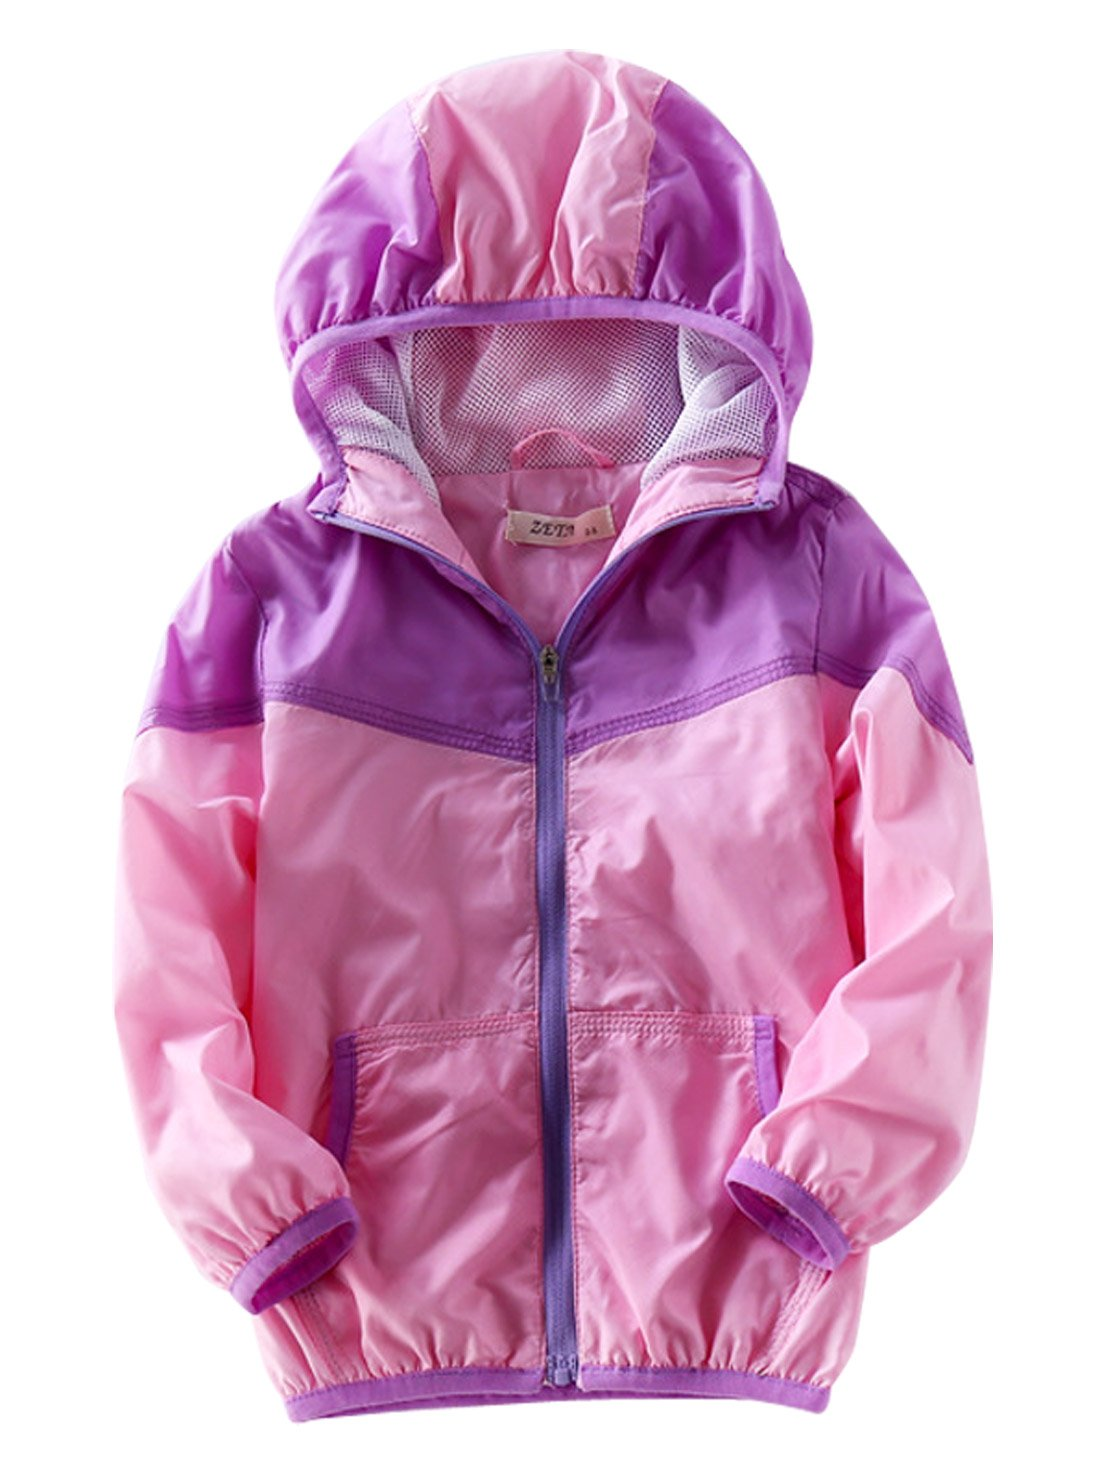 Aivtalk Girls Skin Coat Two Slant Pockets Elatic Cuff Cinched Waist Windproof Warm Wind Jacket 4-5T Pink